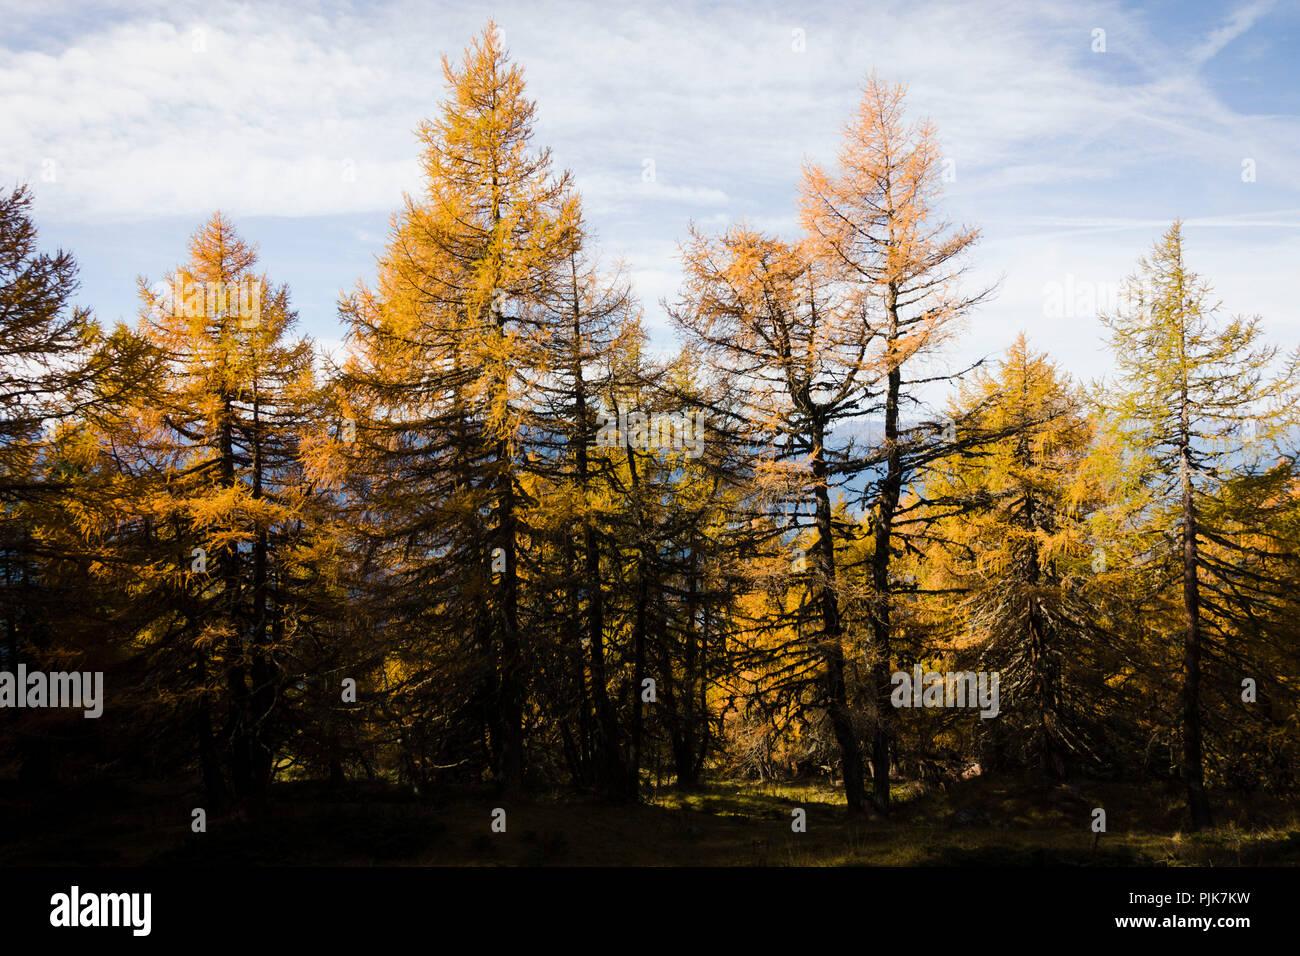 Autumn forest, Obermillstatt, Lake Millstatt, Carinthia, Austria - Stock Image